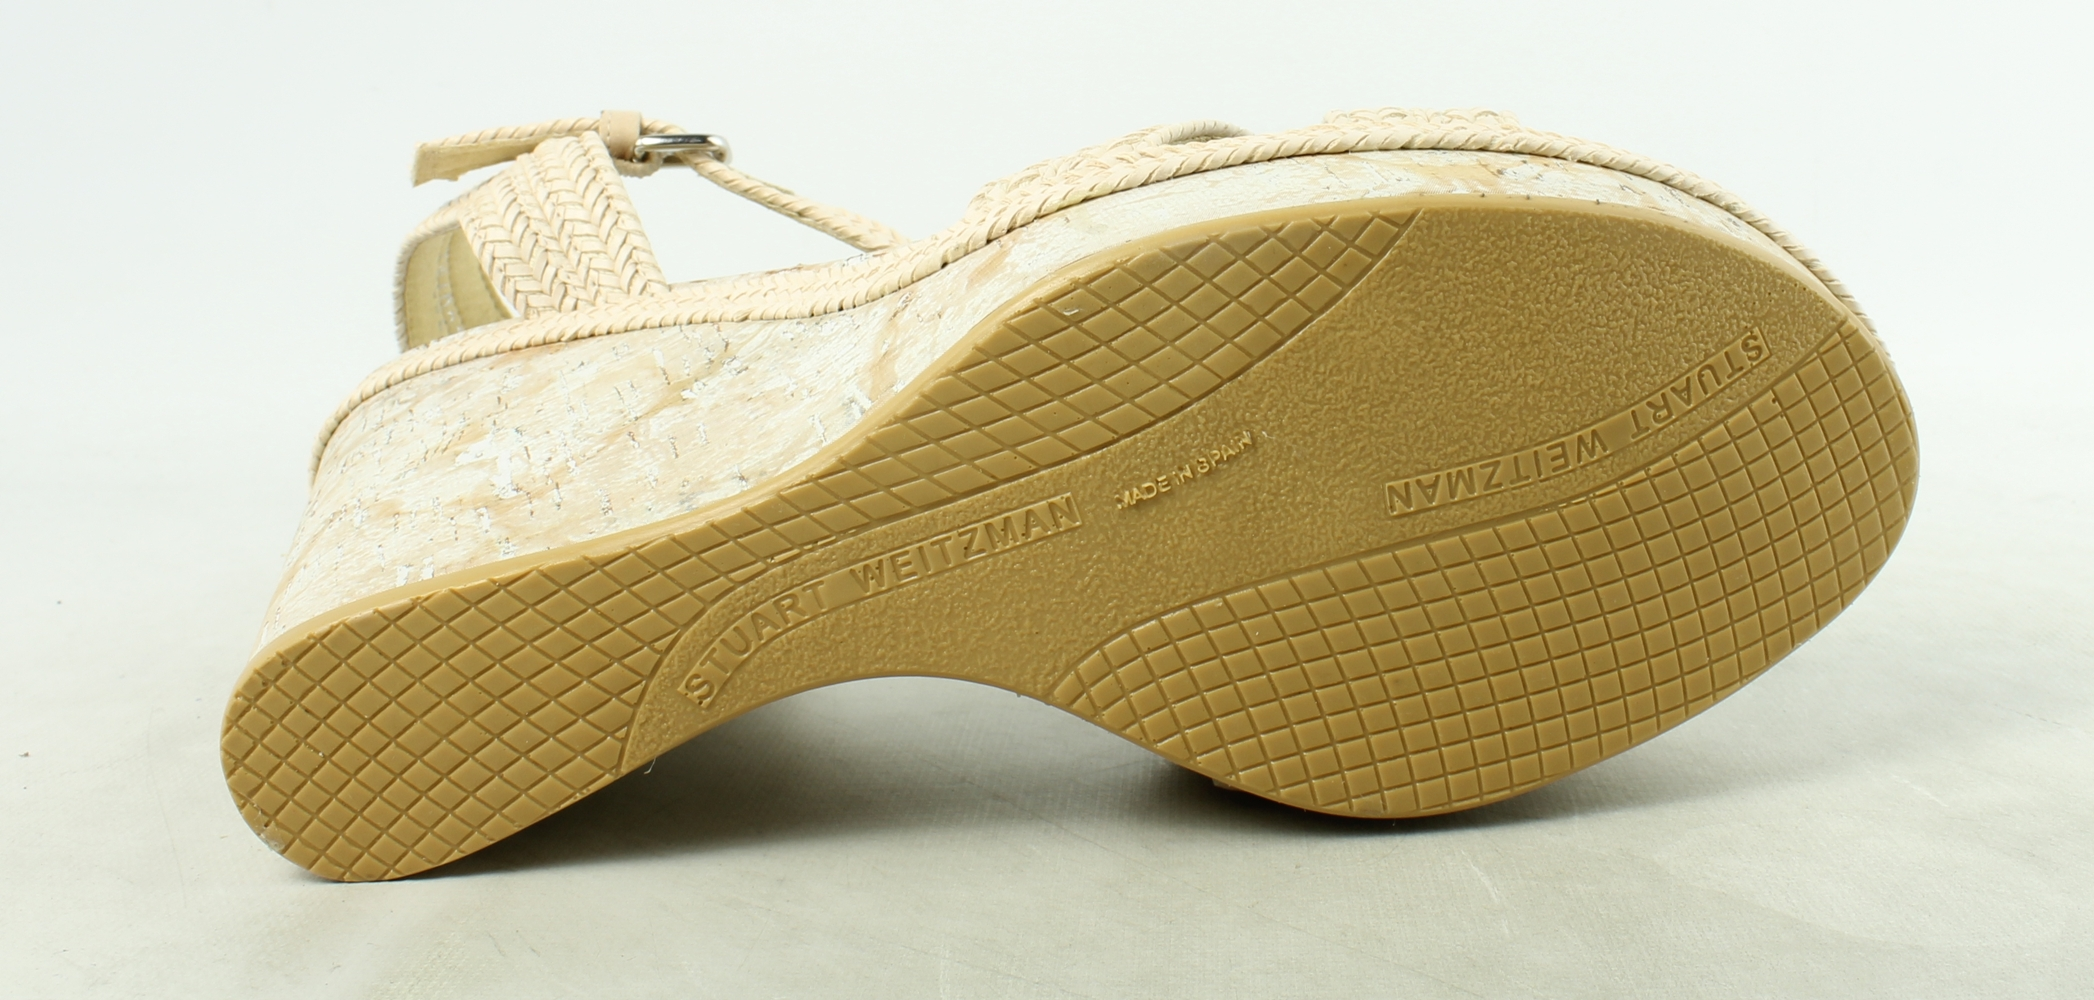 Stuart Weitzman Womens  IvoryLaniard Ankle Strap Heels Size 10.5 New